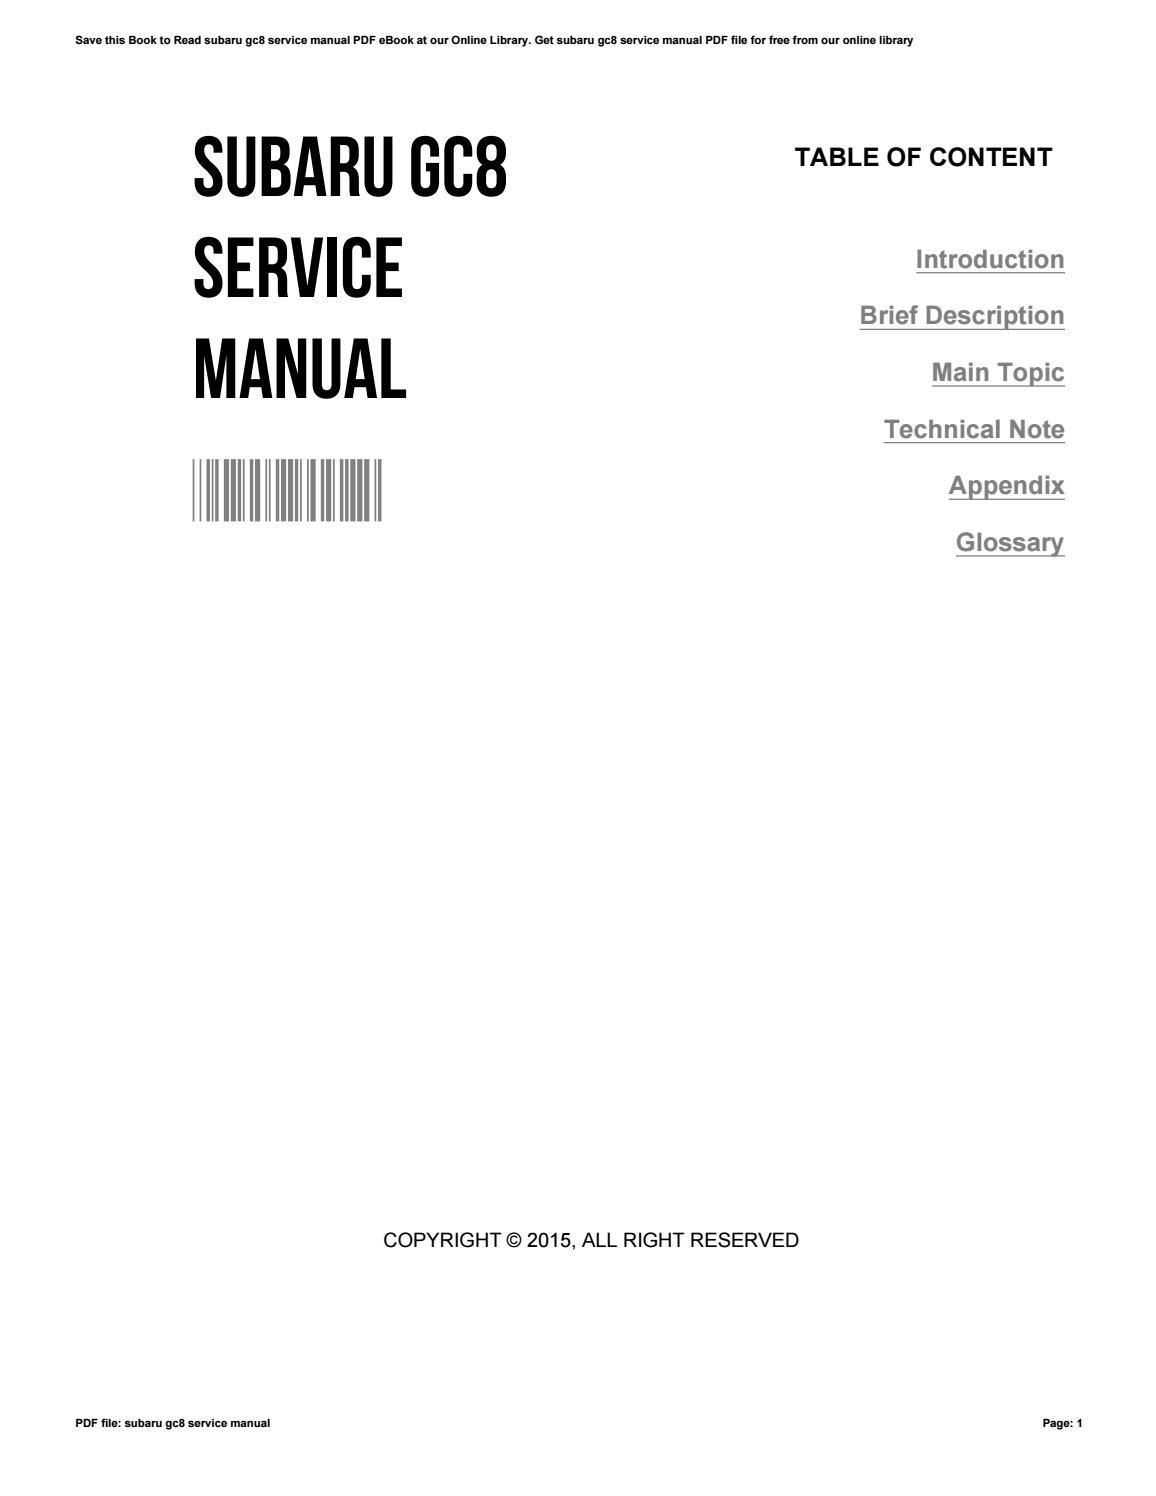 Ferrari 1994 1999 F355 Workshop Repair Service Manual